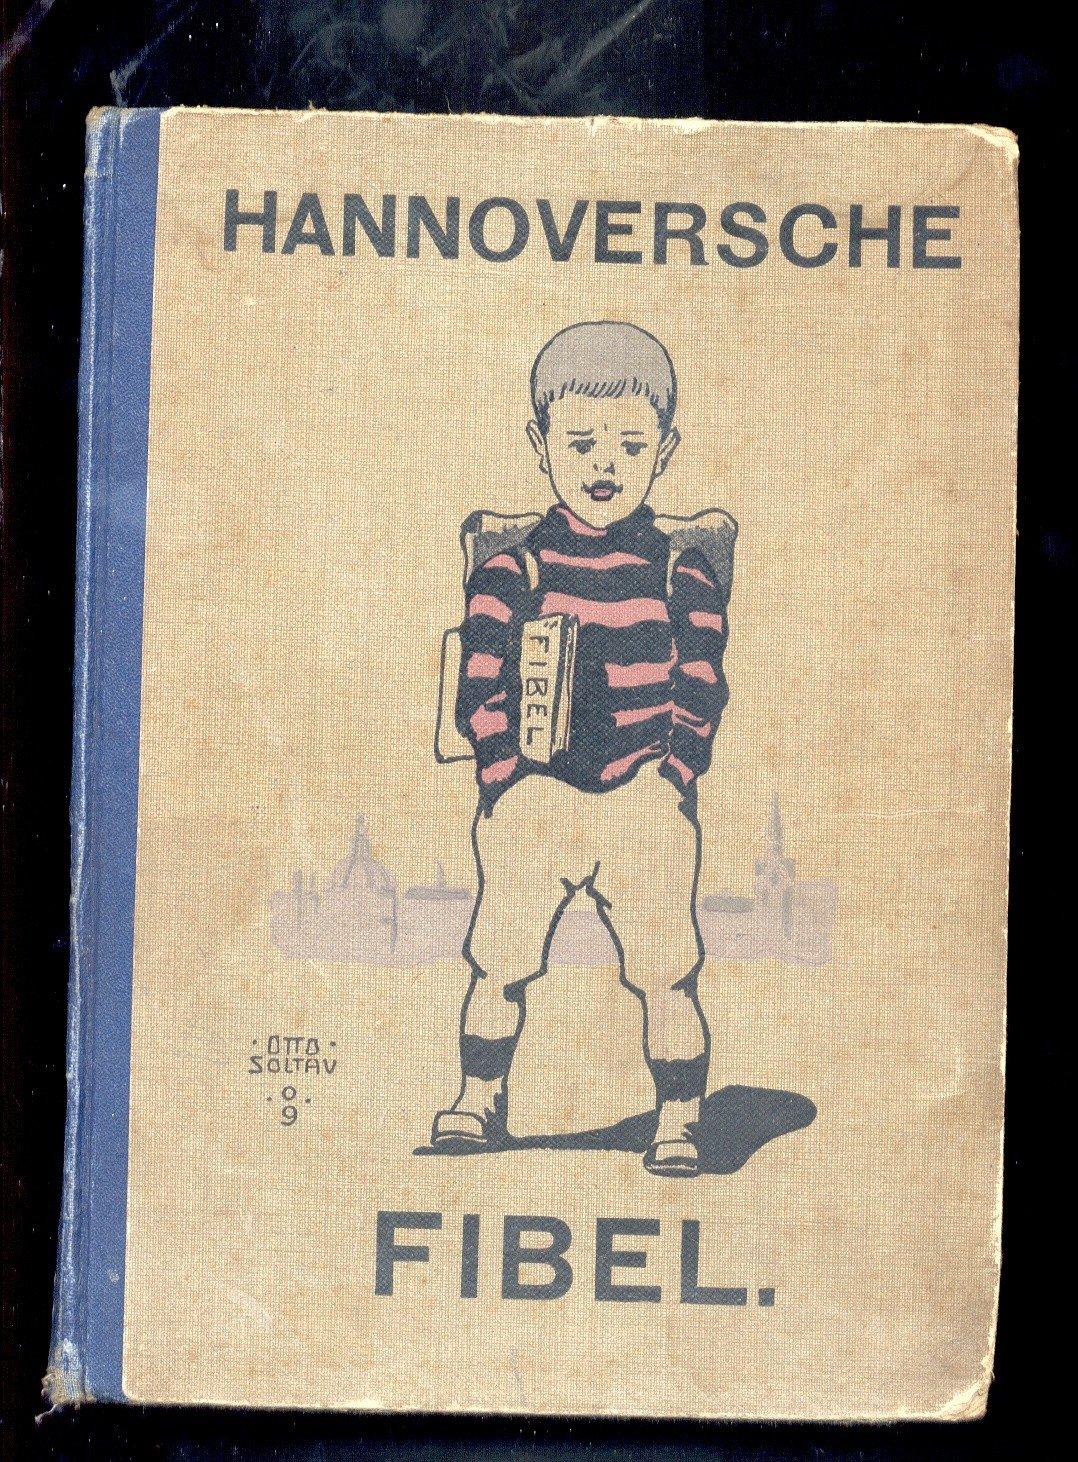 Lehrerverein Hannover Hannoversche Fibel Hrsg.